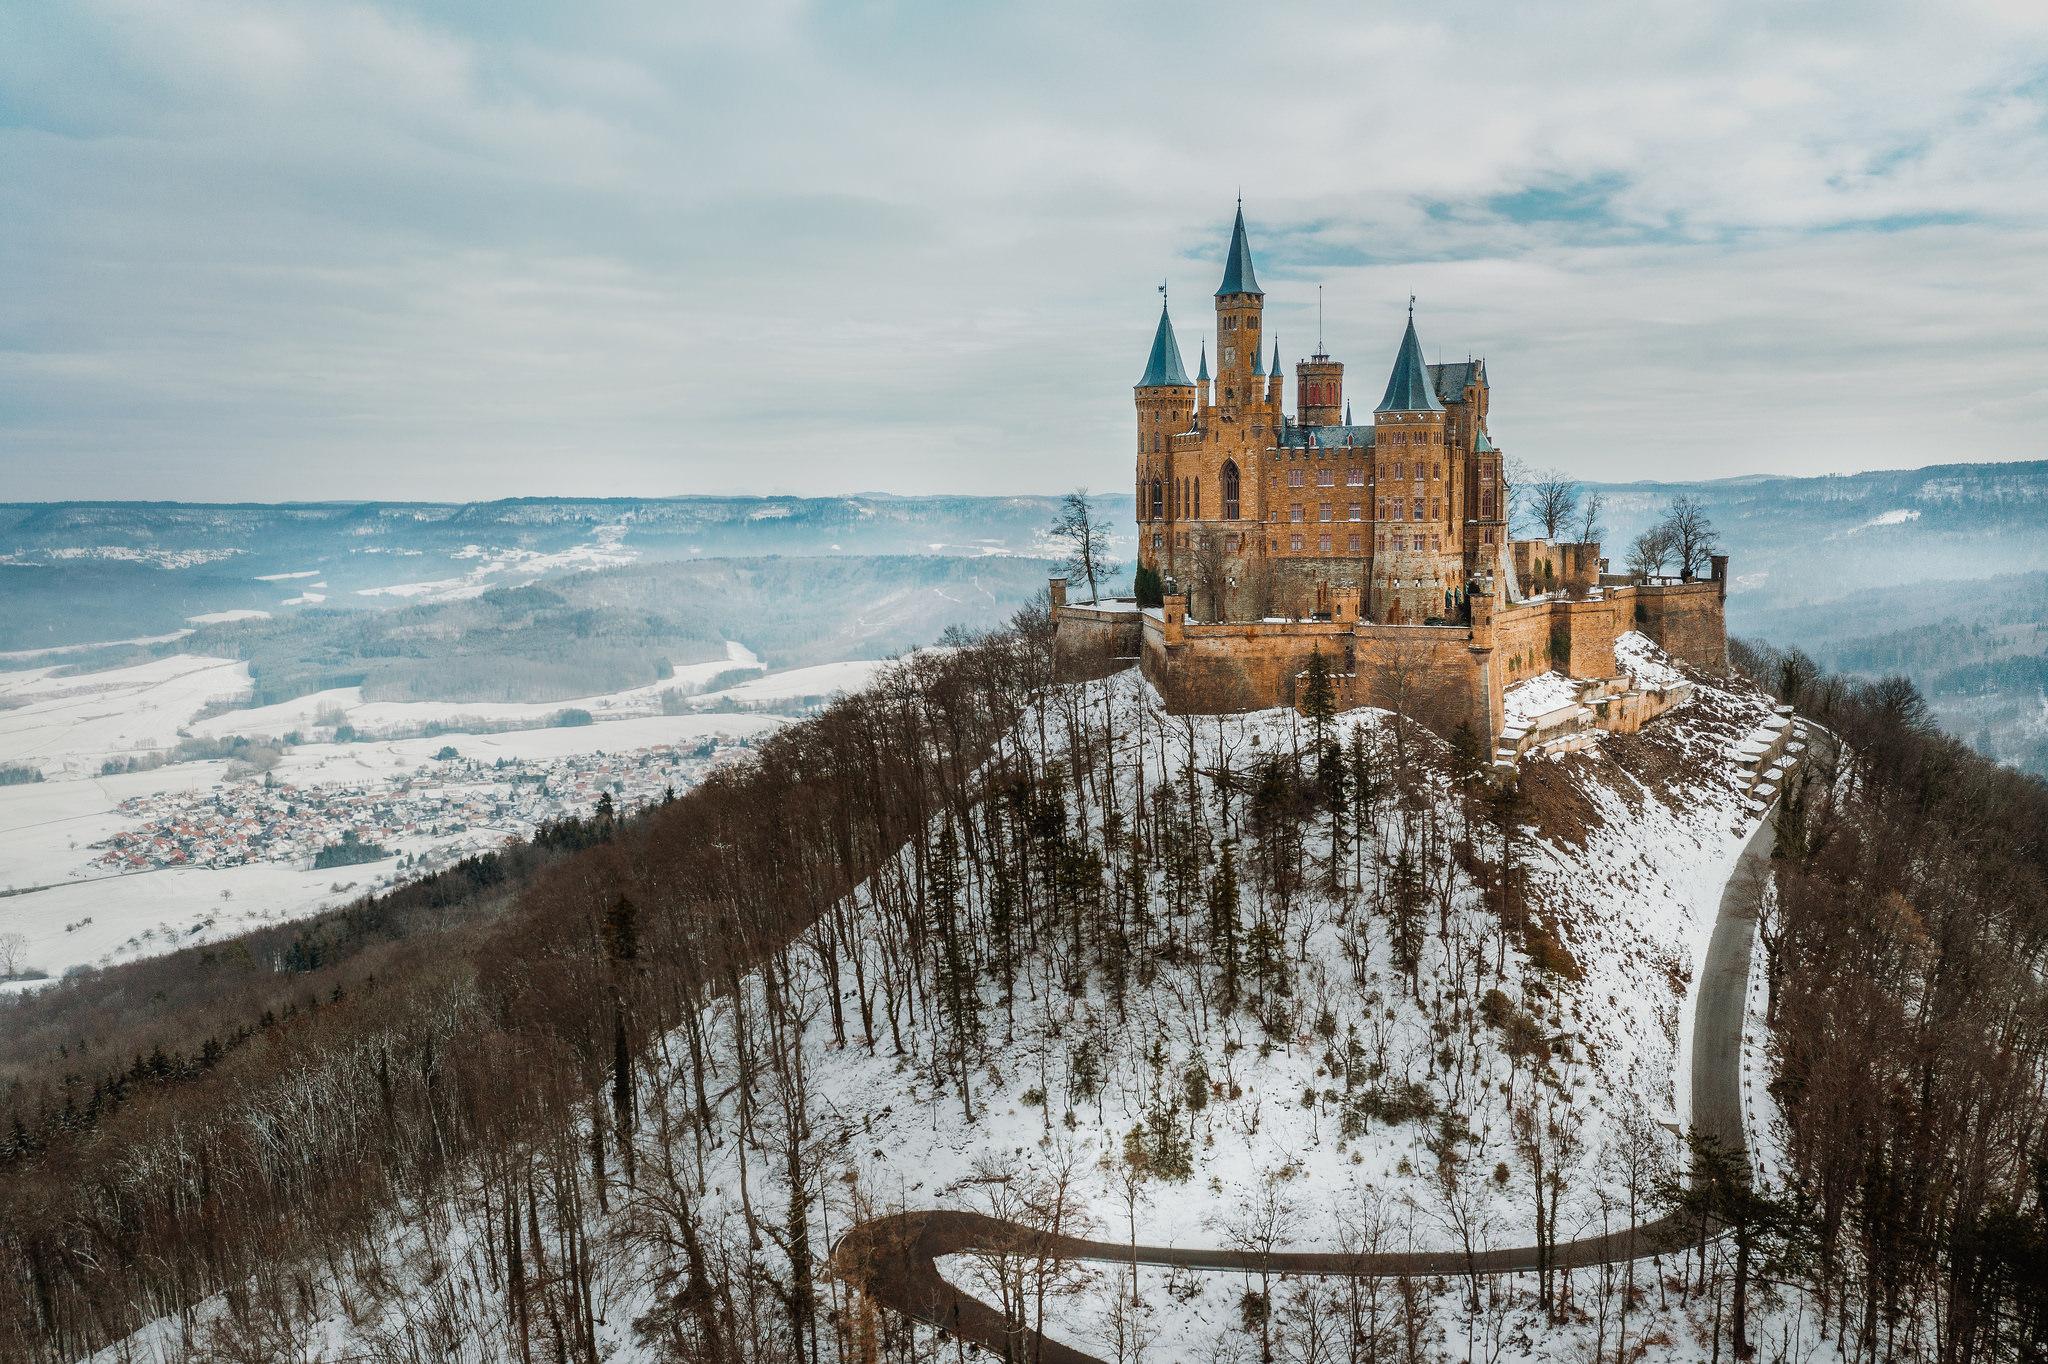 Landschaftsfotografie fotograf filmemacher frankfurt patrick schmetzer drohne landschaft natur 57